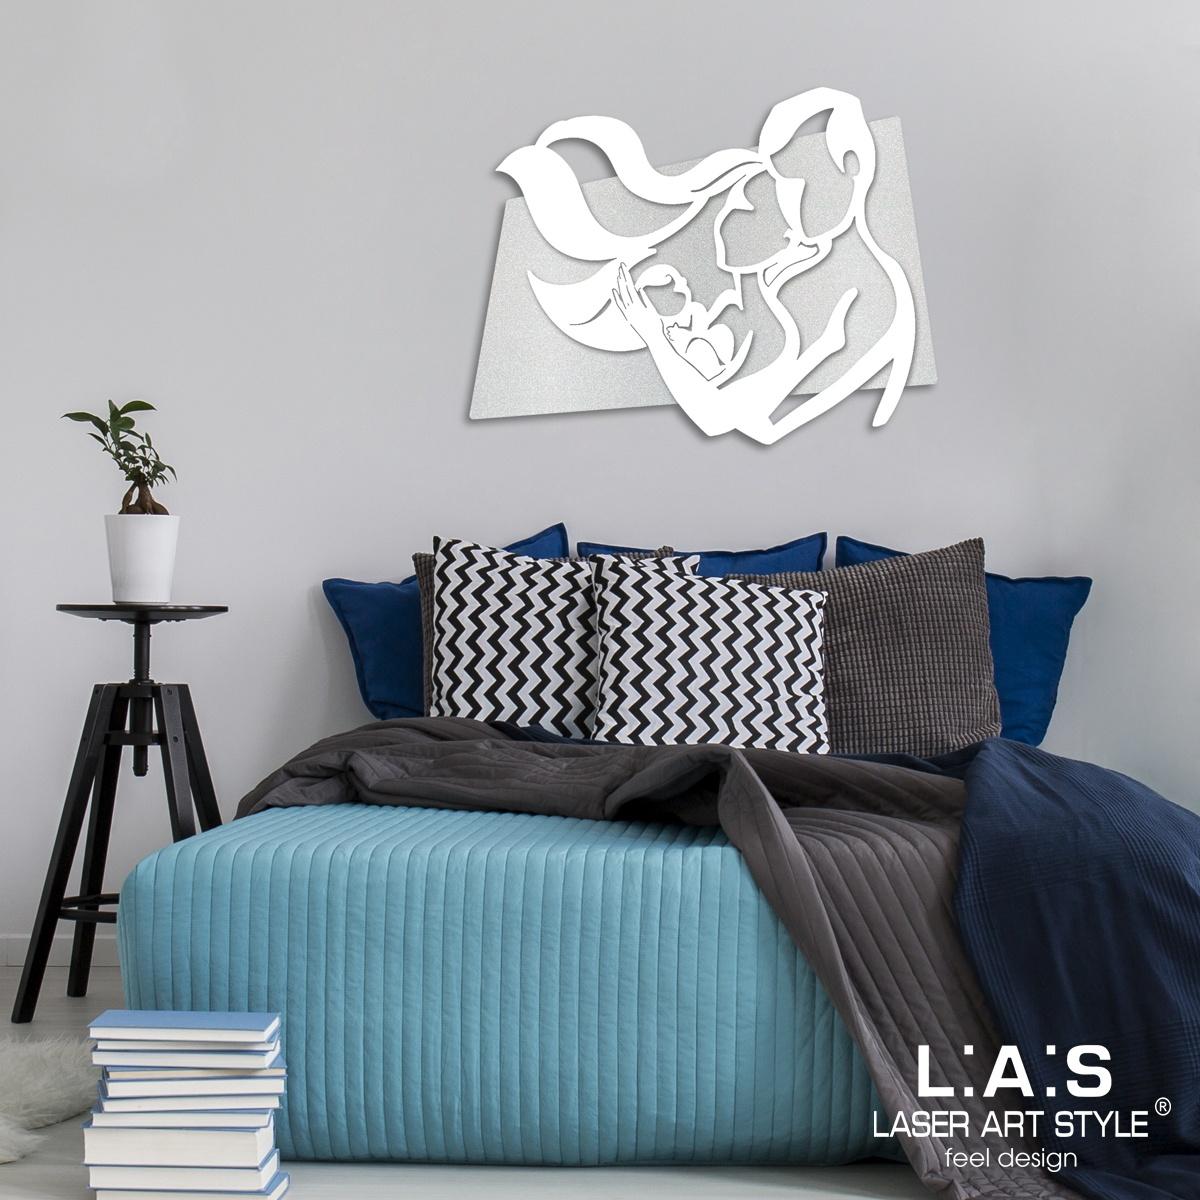 L:A:S - Laser Art Style - CAPOLETTO DESIGN MODERNO – SI-323XL ARGENTO – BIANCO